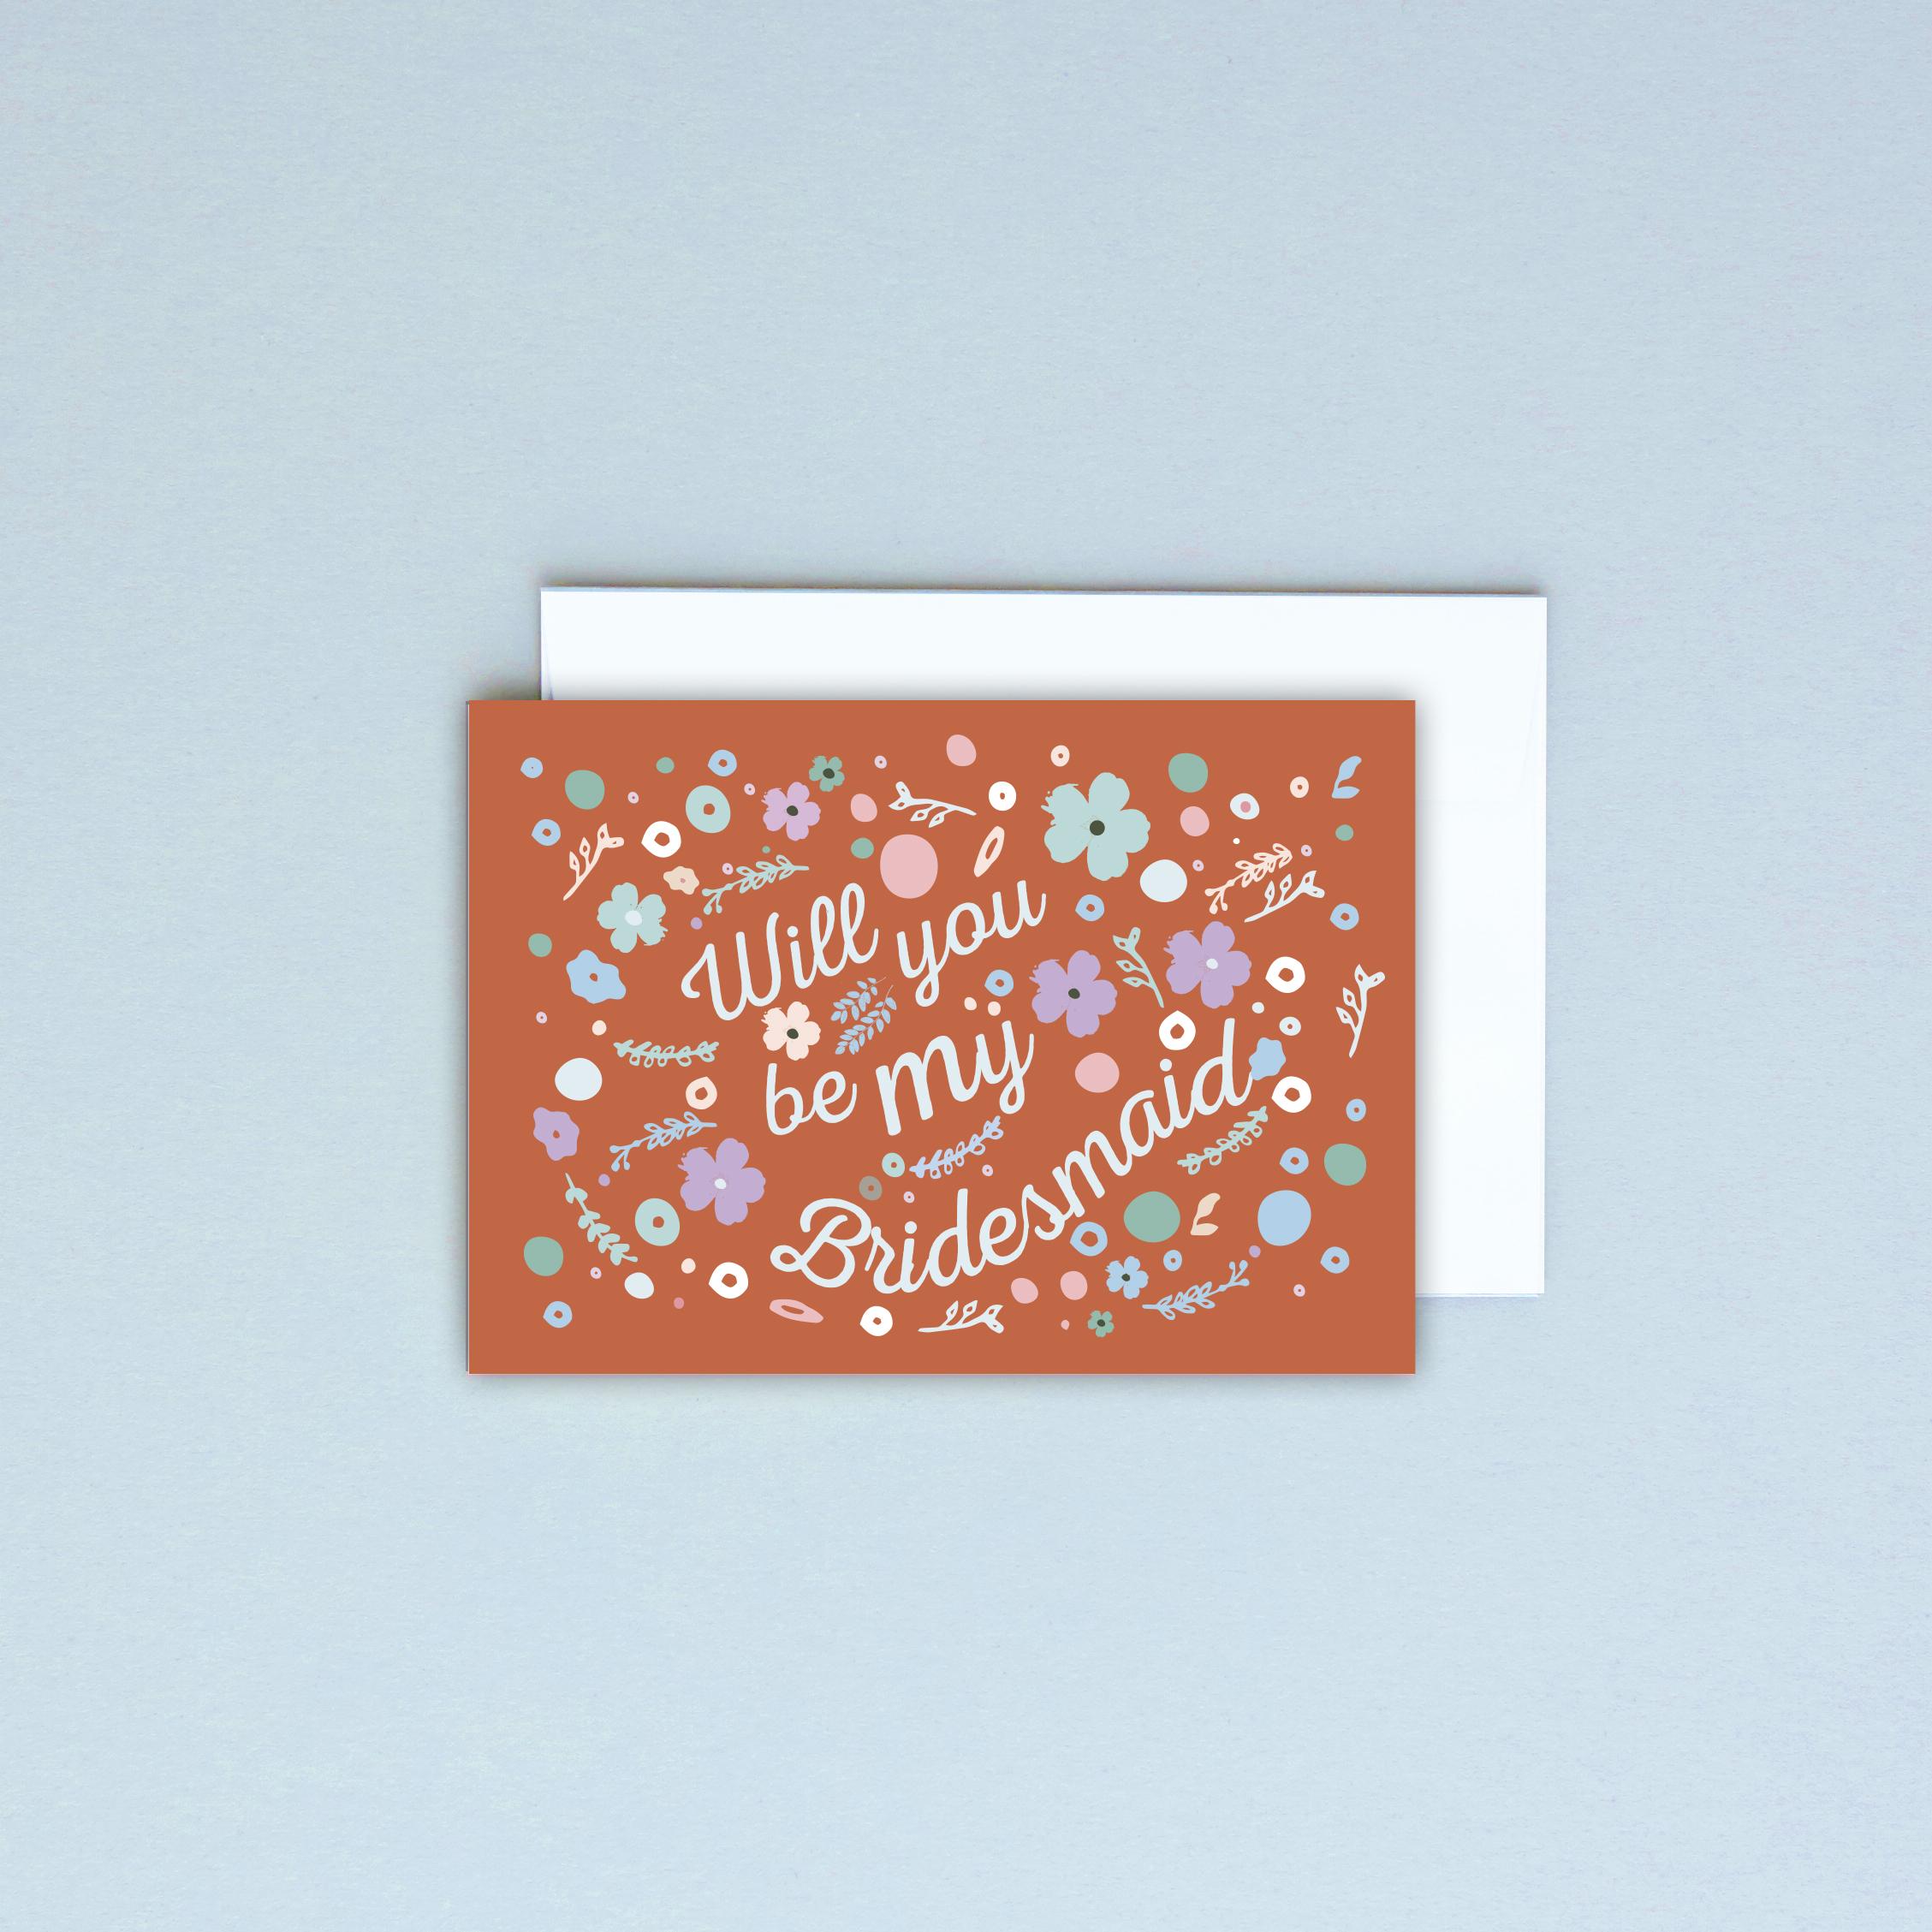 Bridesmanid Card Burnt Orange.jpg